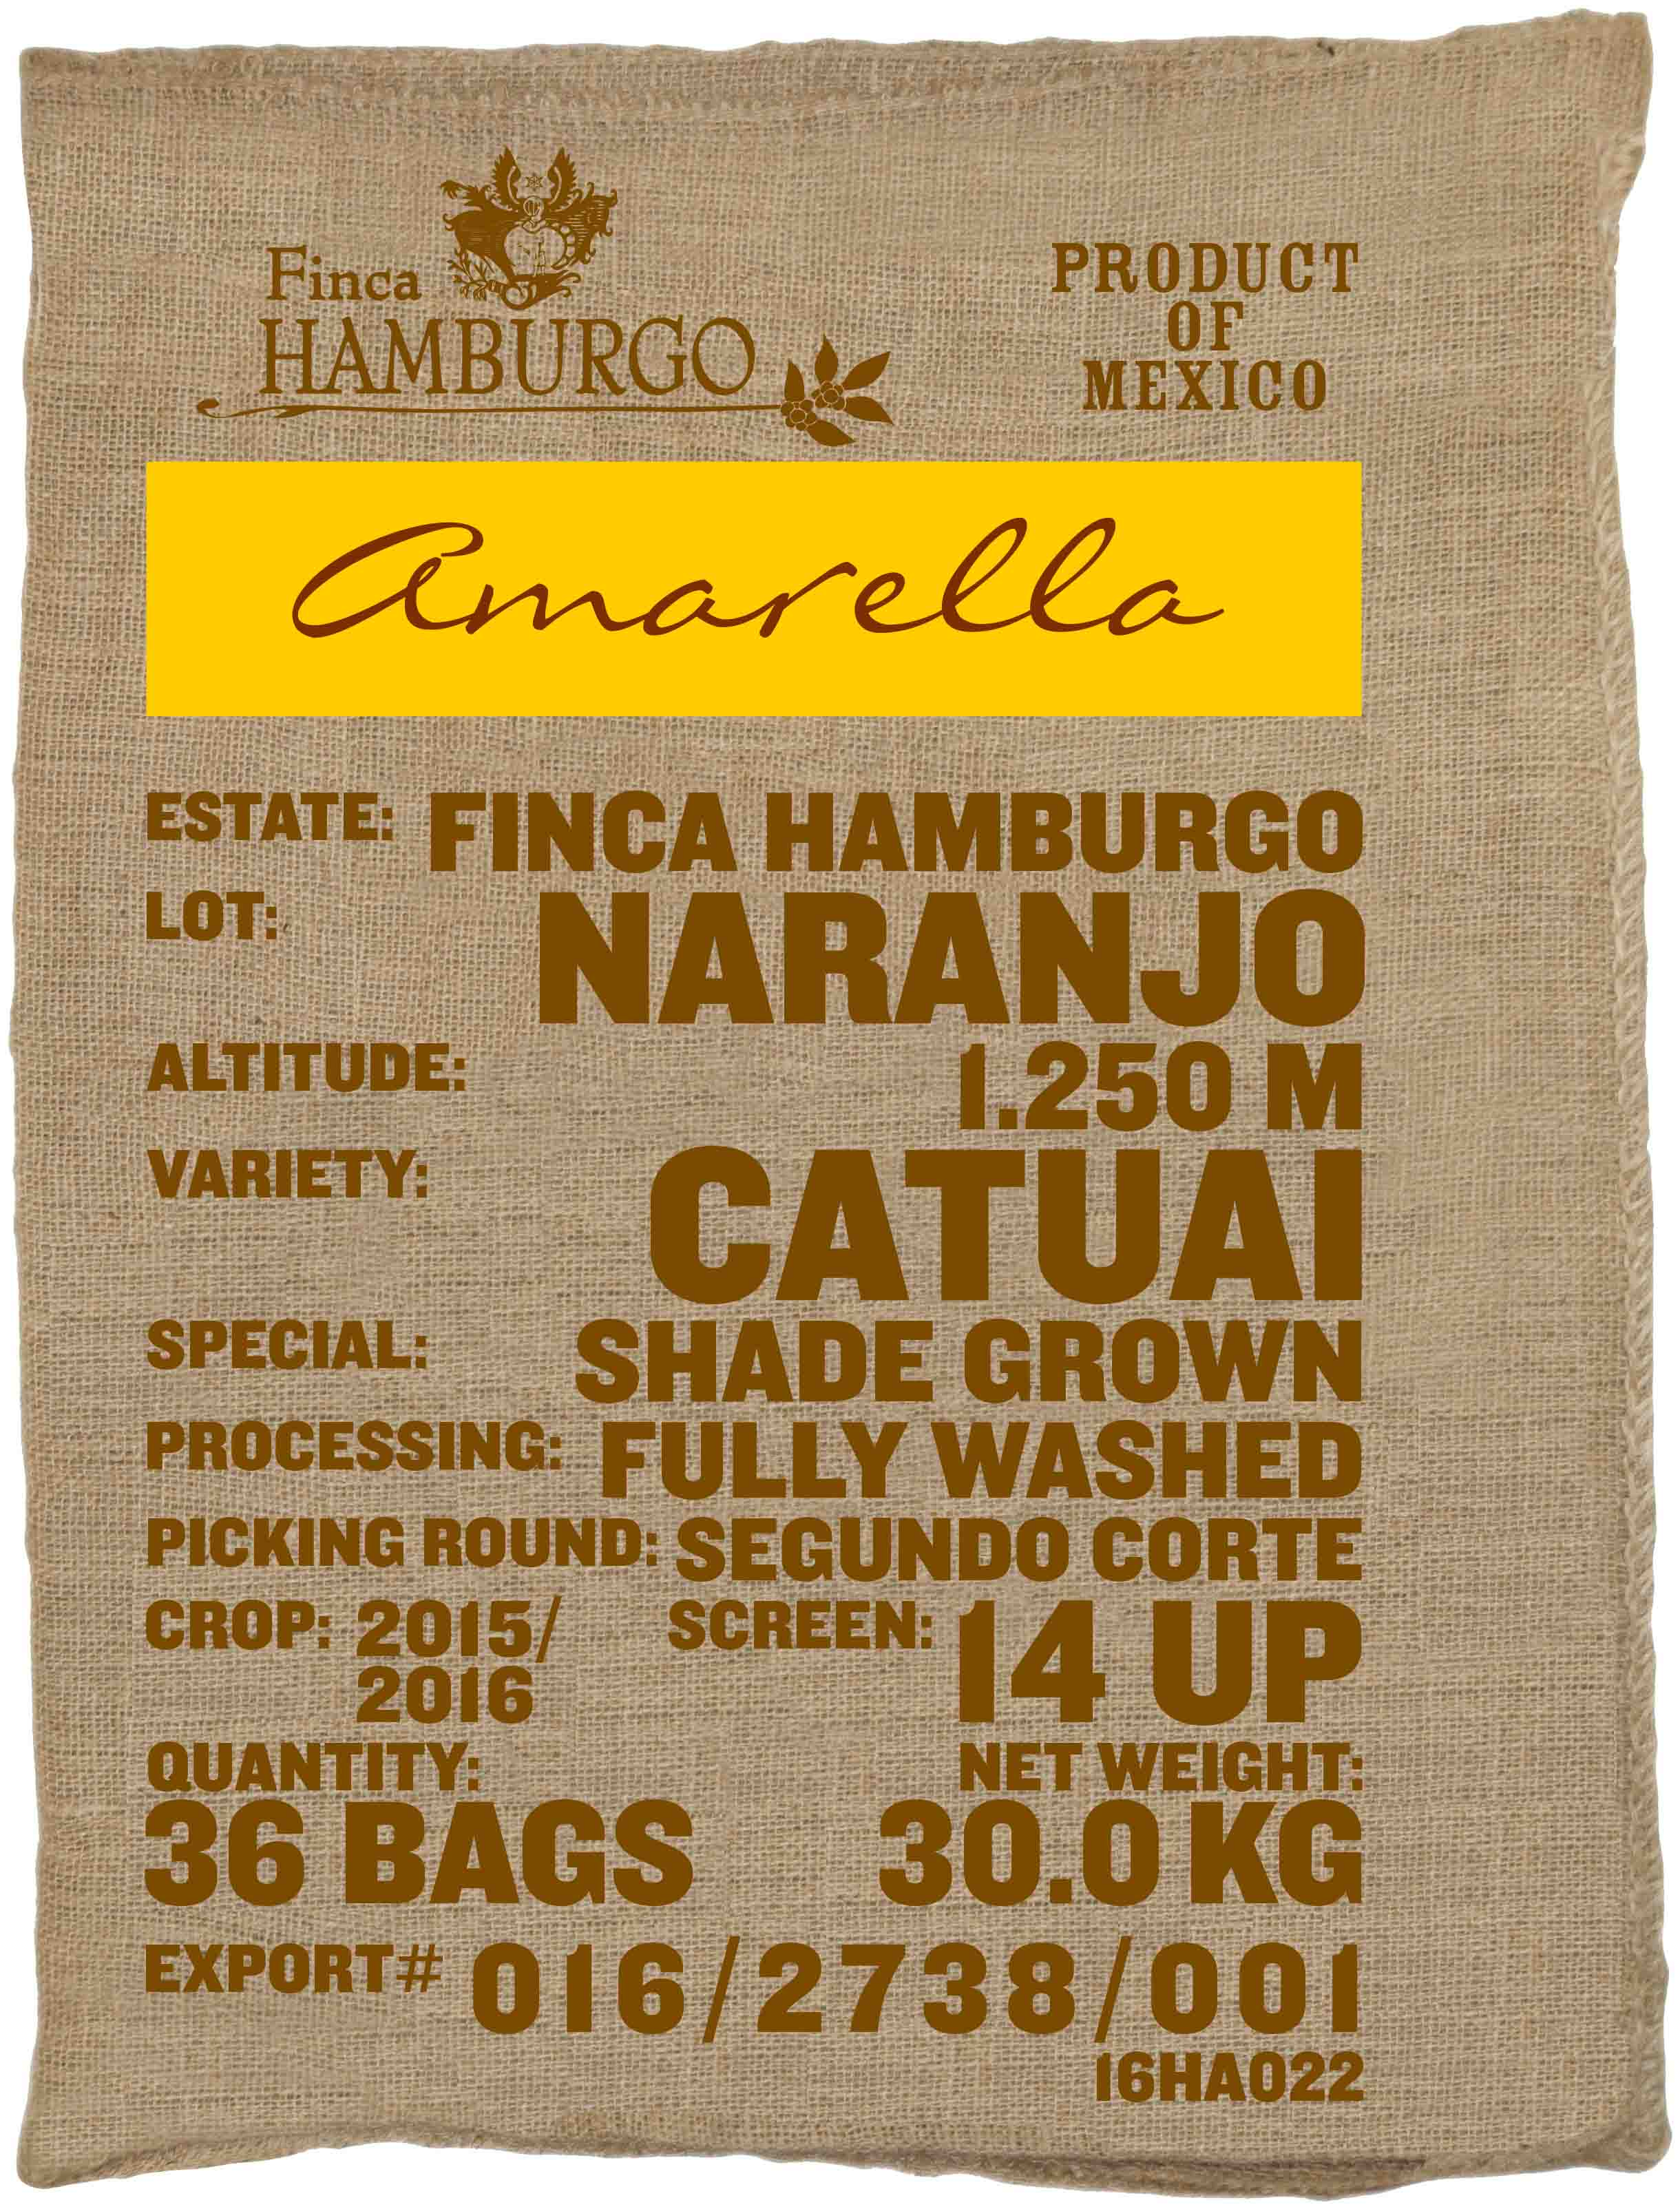 Ein Rohkaffeesack amarella Parzellenkaffee Varietät Catuai Segundo Corte. Finca Hamburgo Lot Naranjo.